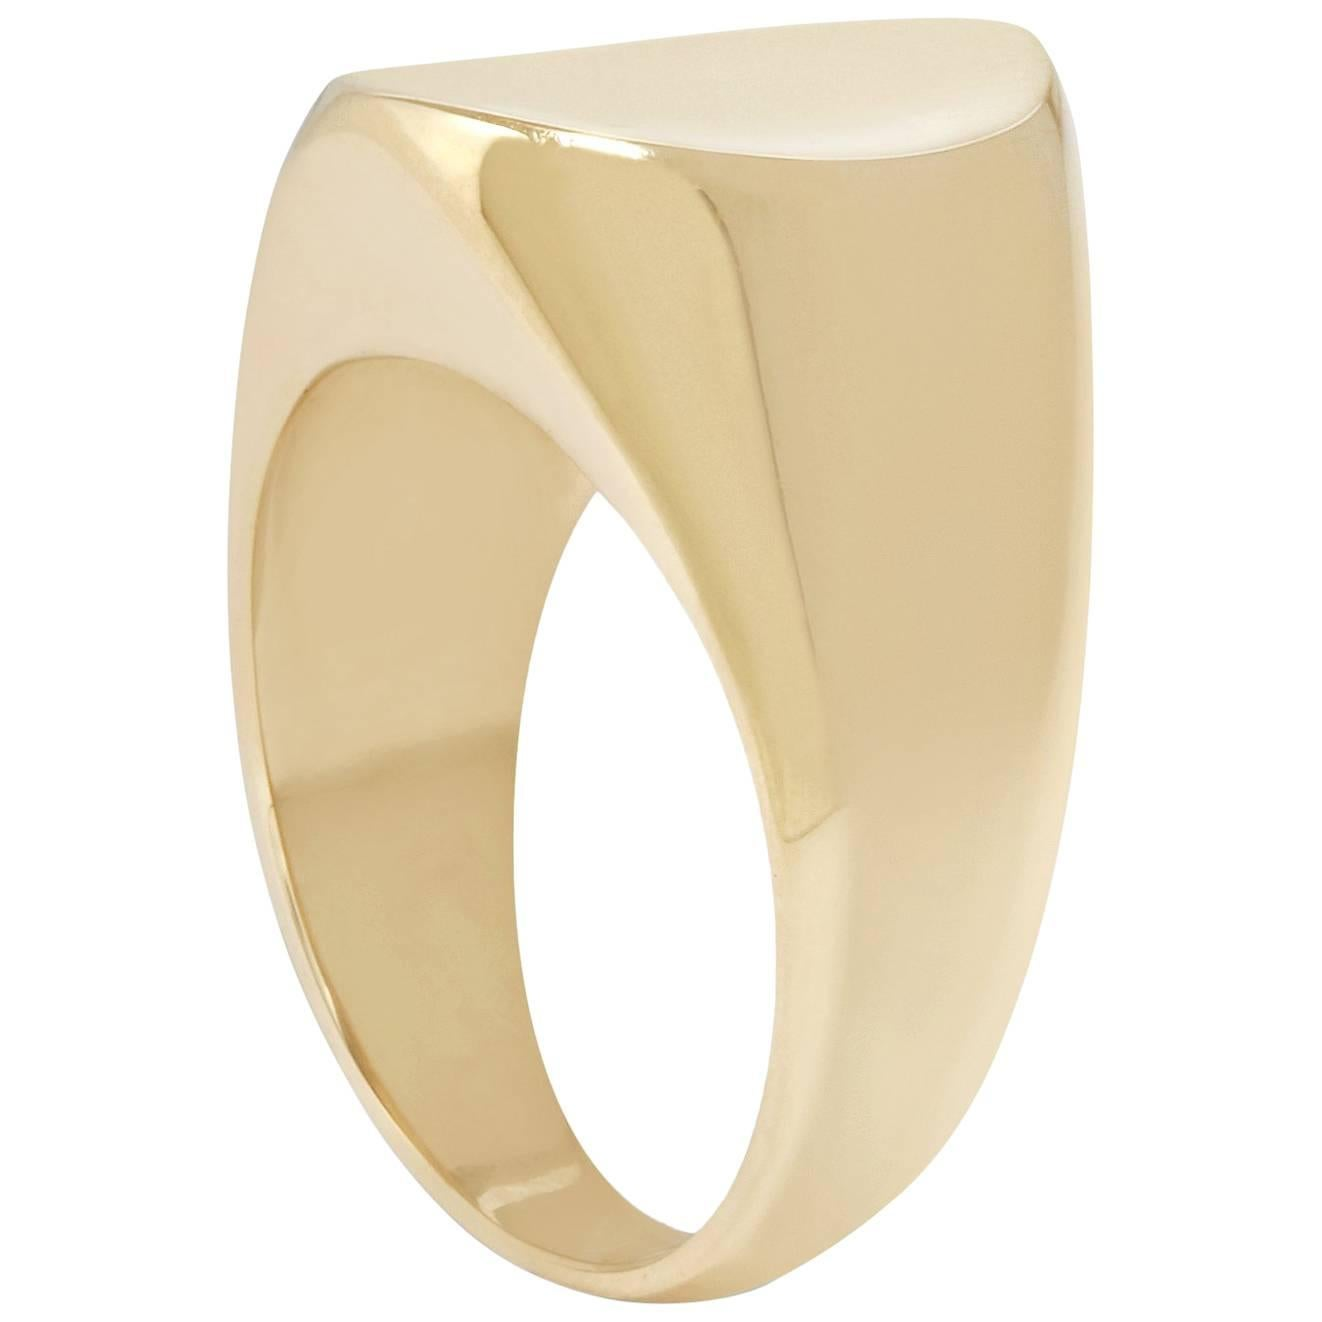 Concave Signet Ring in 18 Karat Gold by Allison Bryan